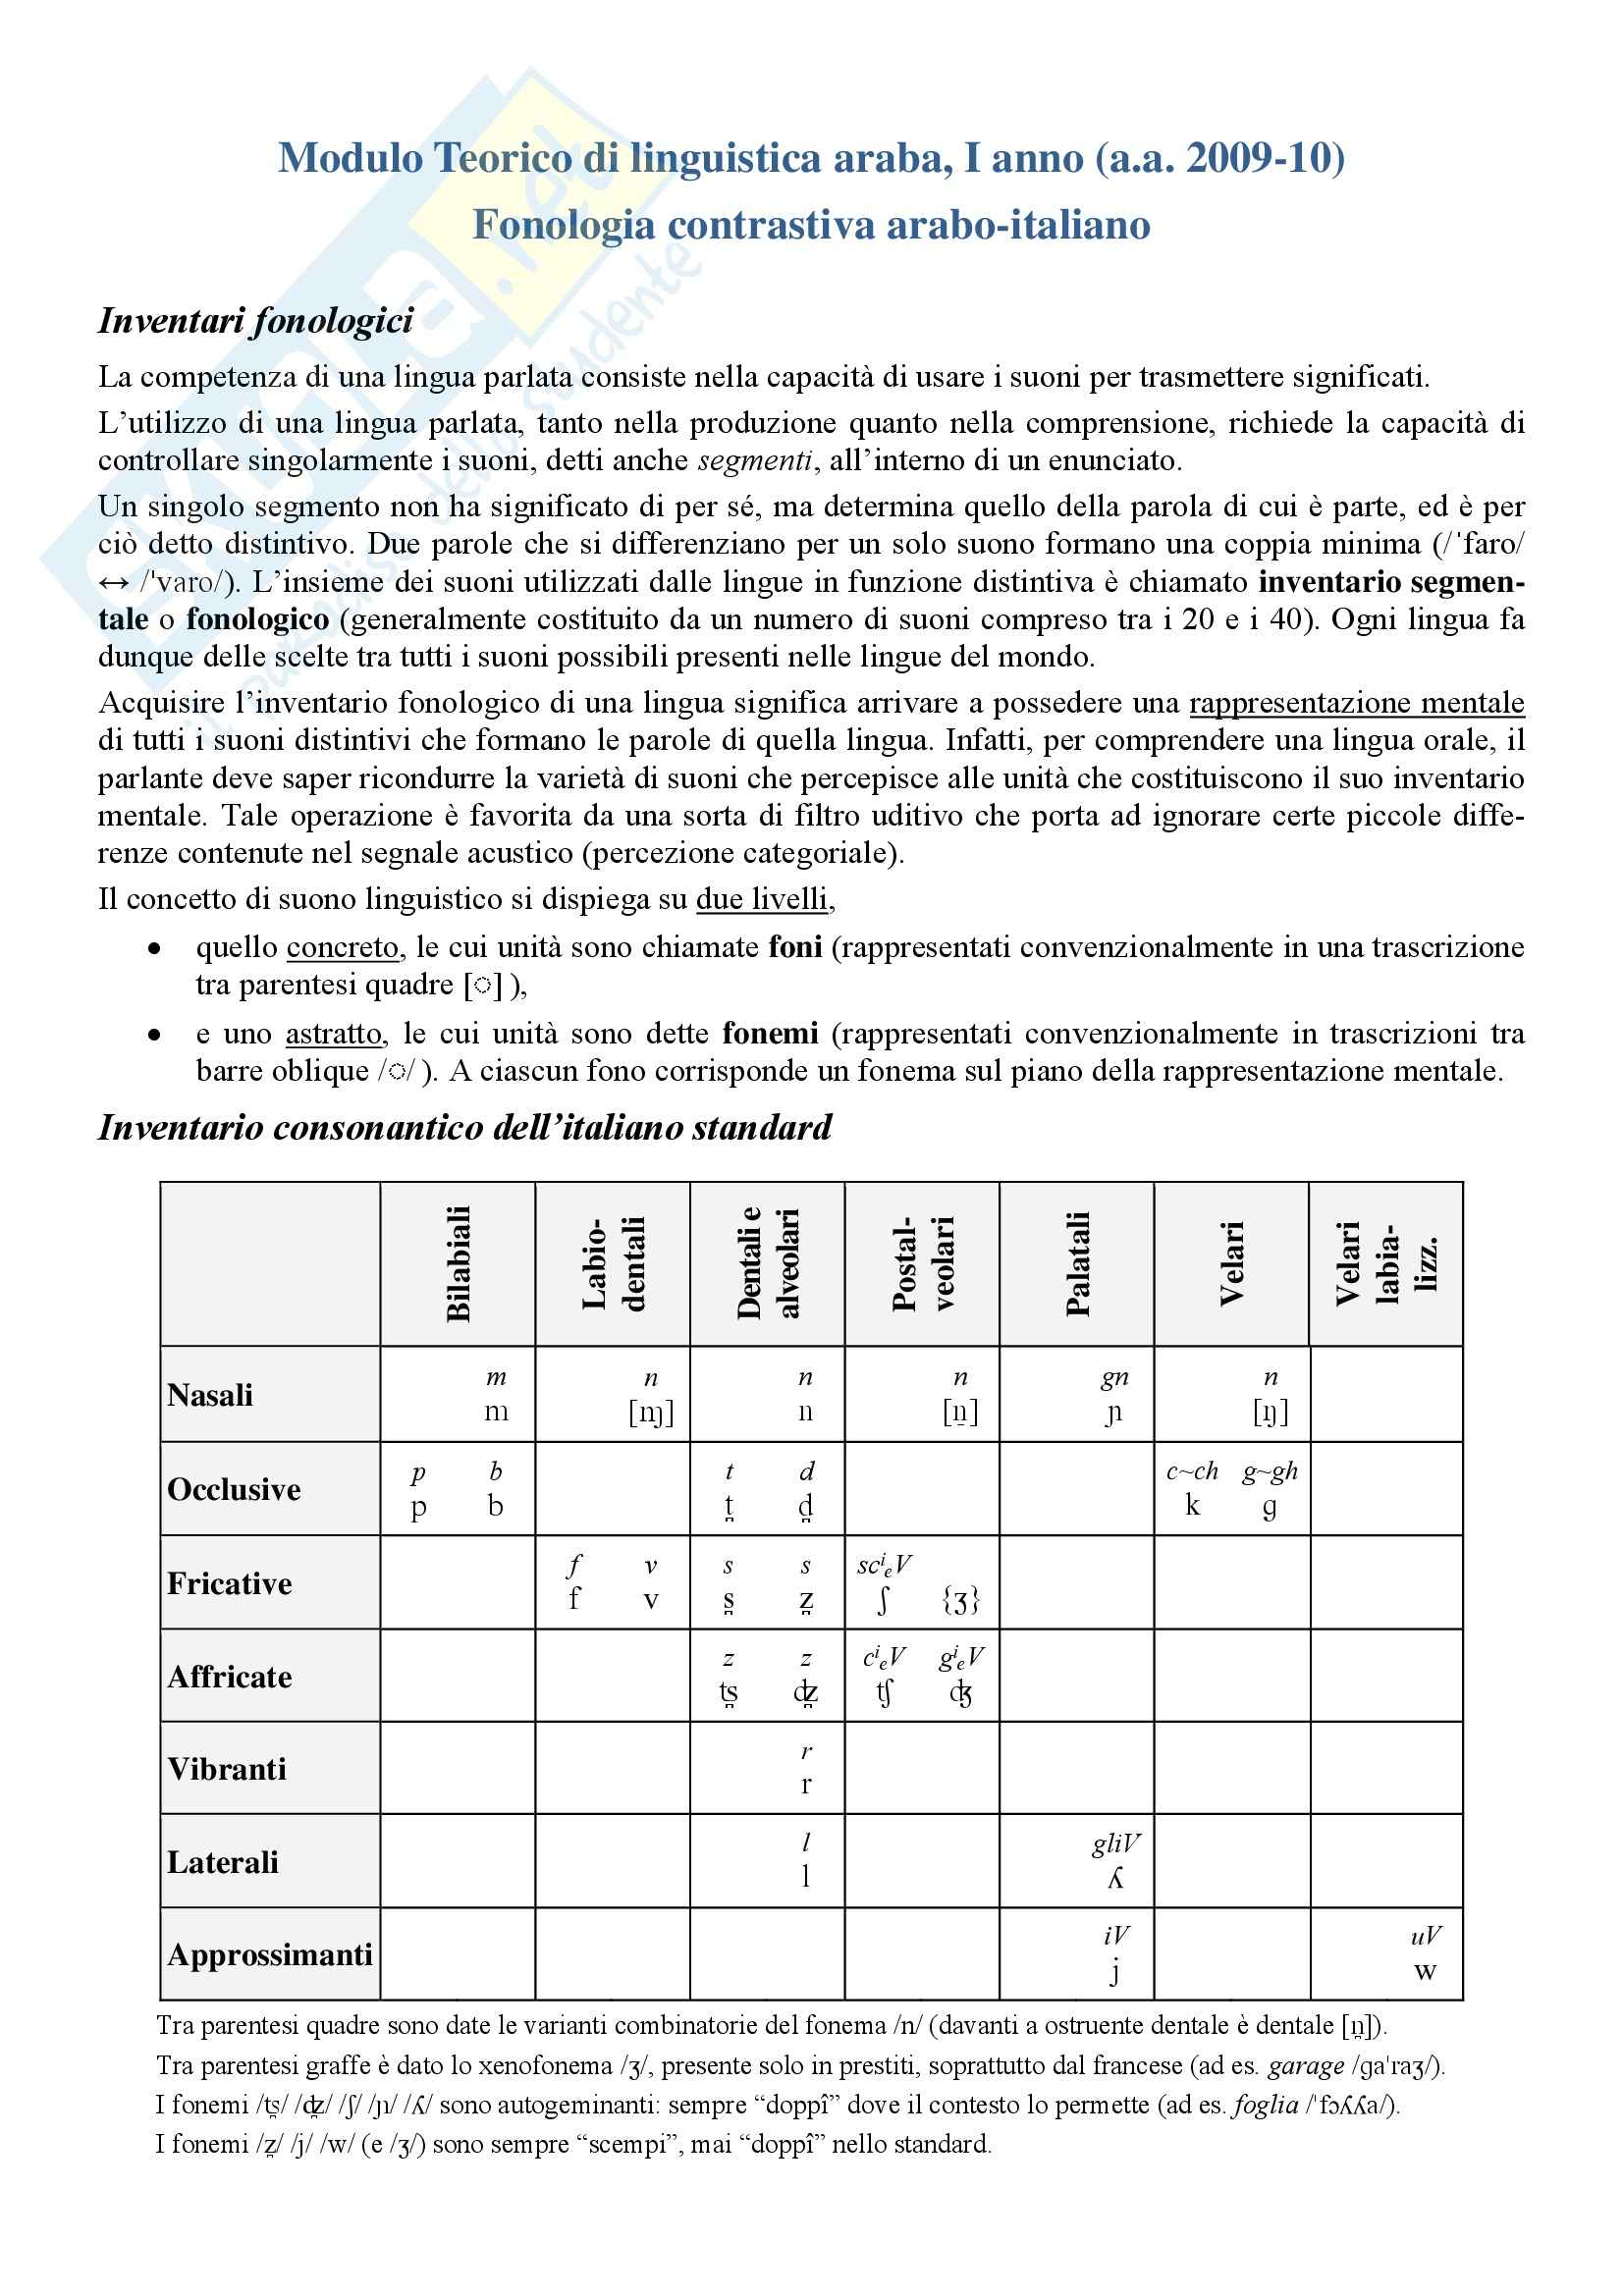 Fonologia contrastiva arabo-italiano